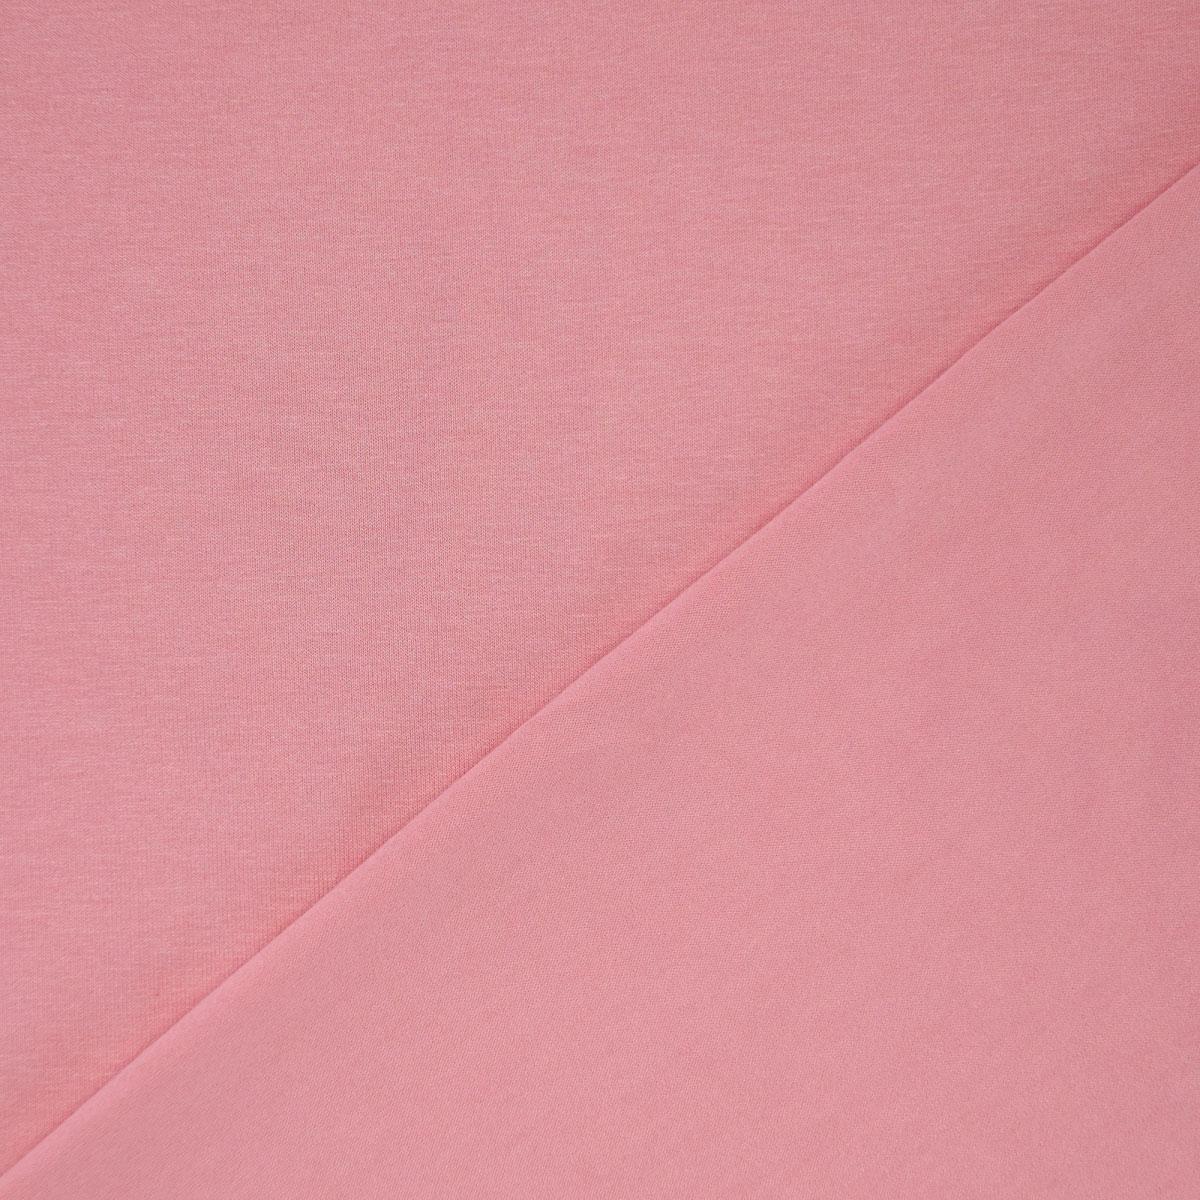 Baumwolljersey uni Meterware rosa 5017